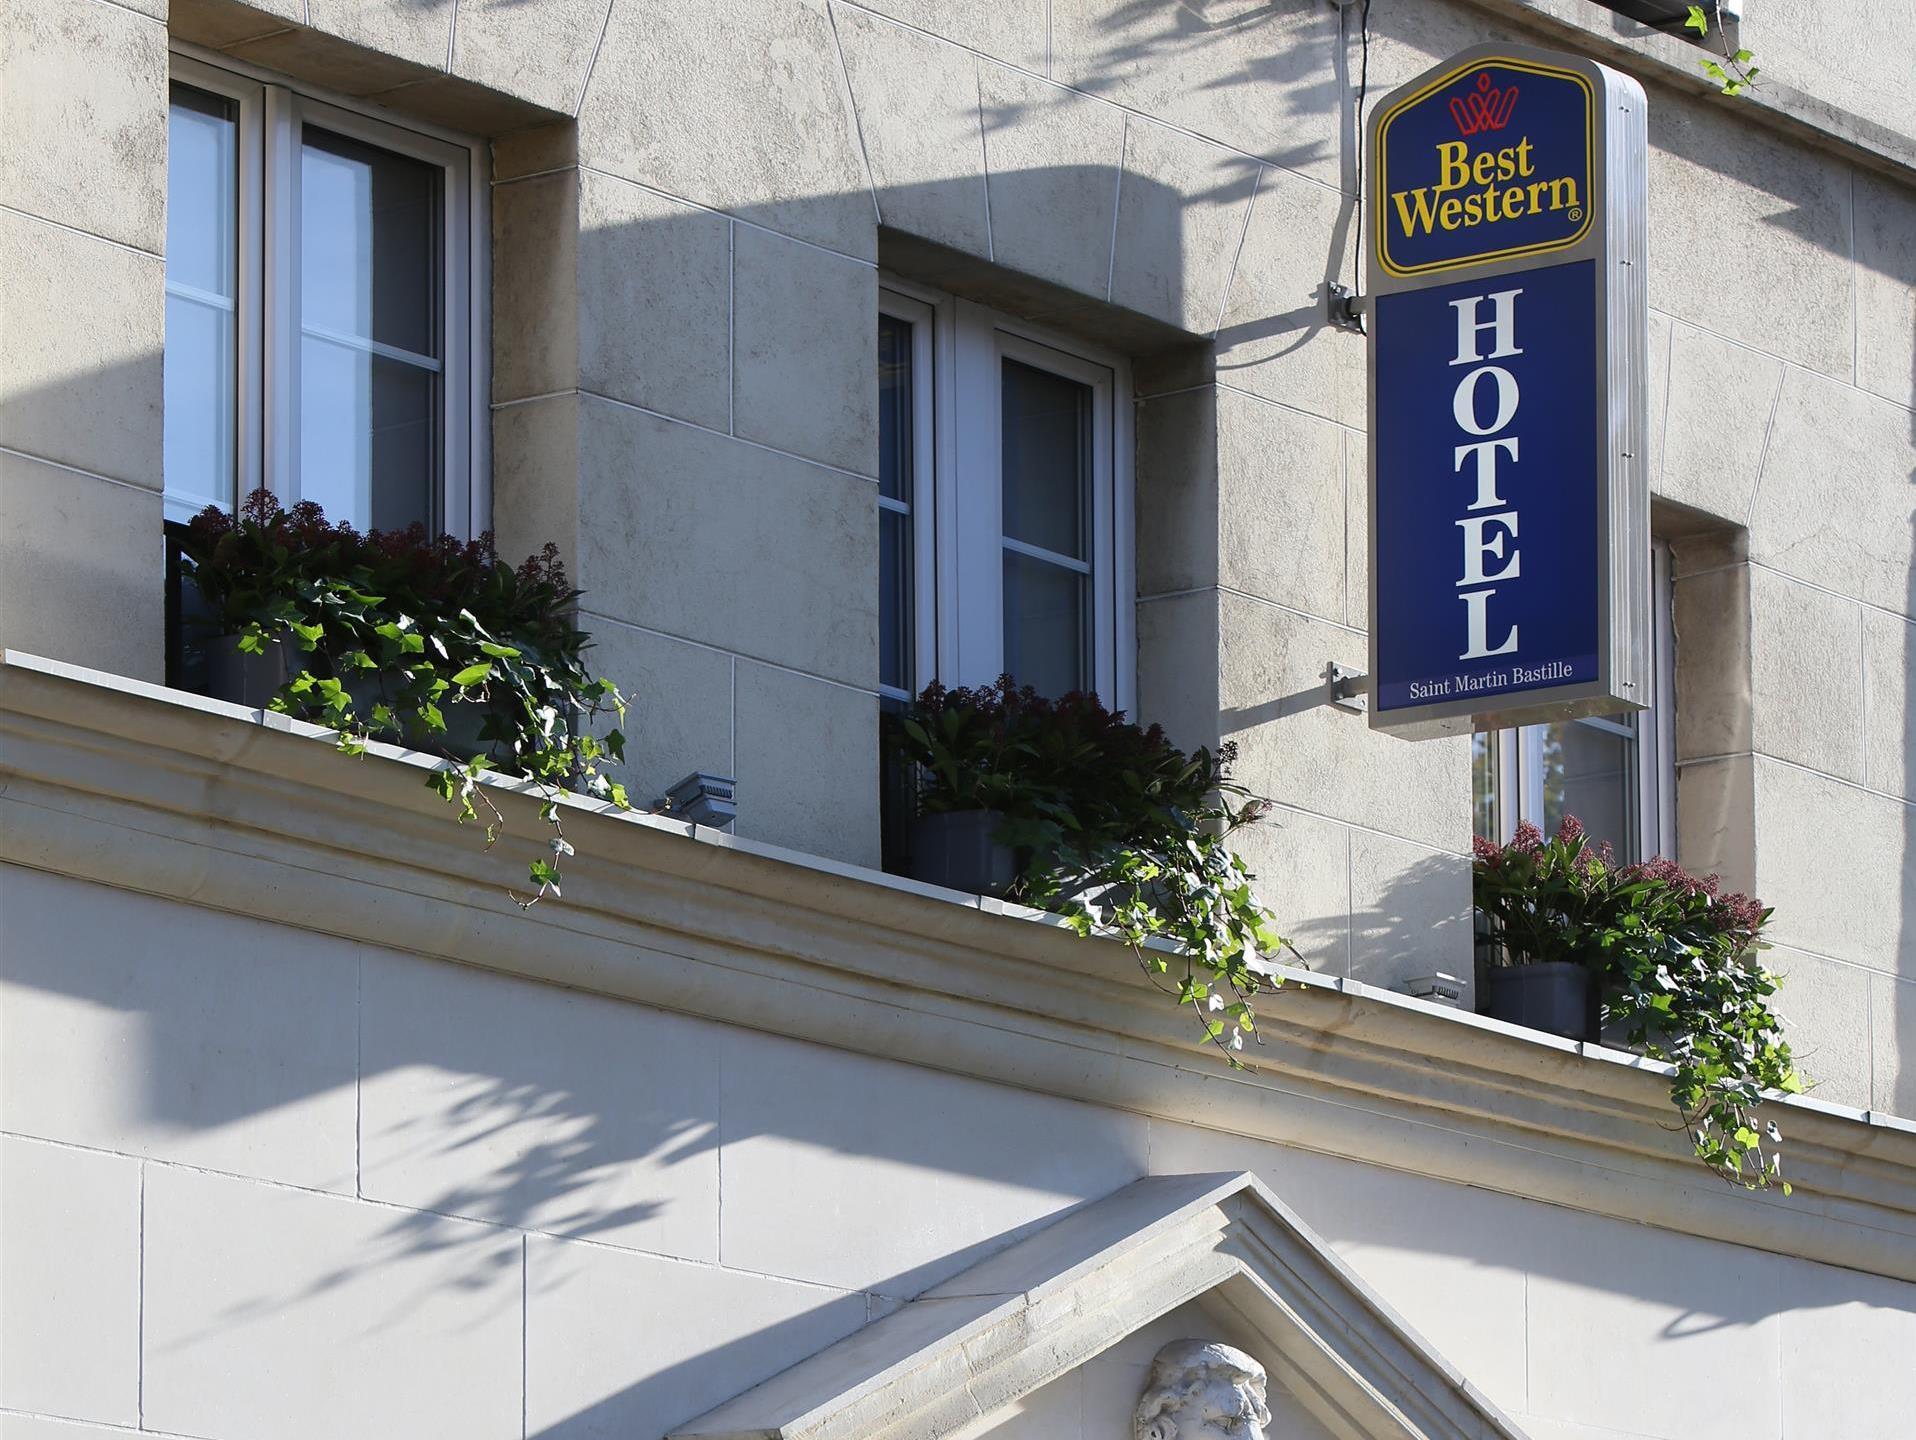 Hotel Saint Martin Bastille